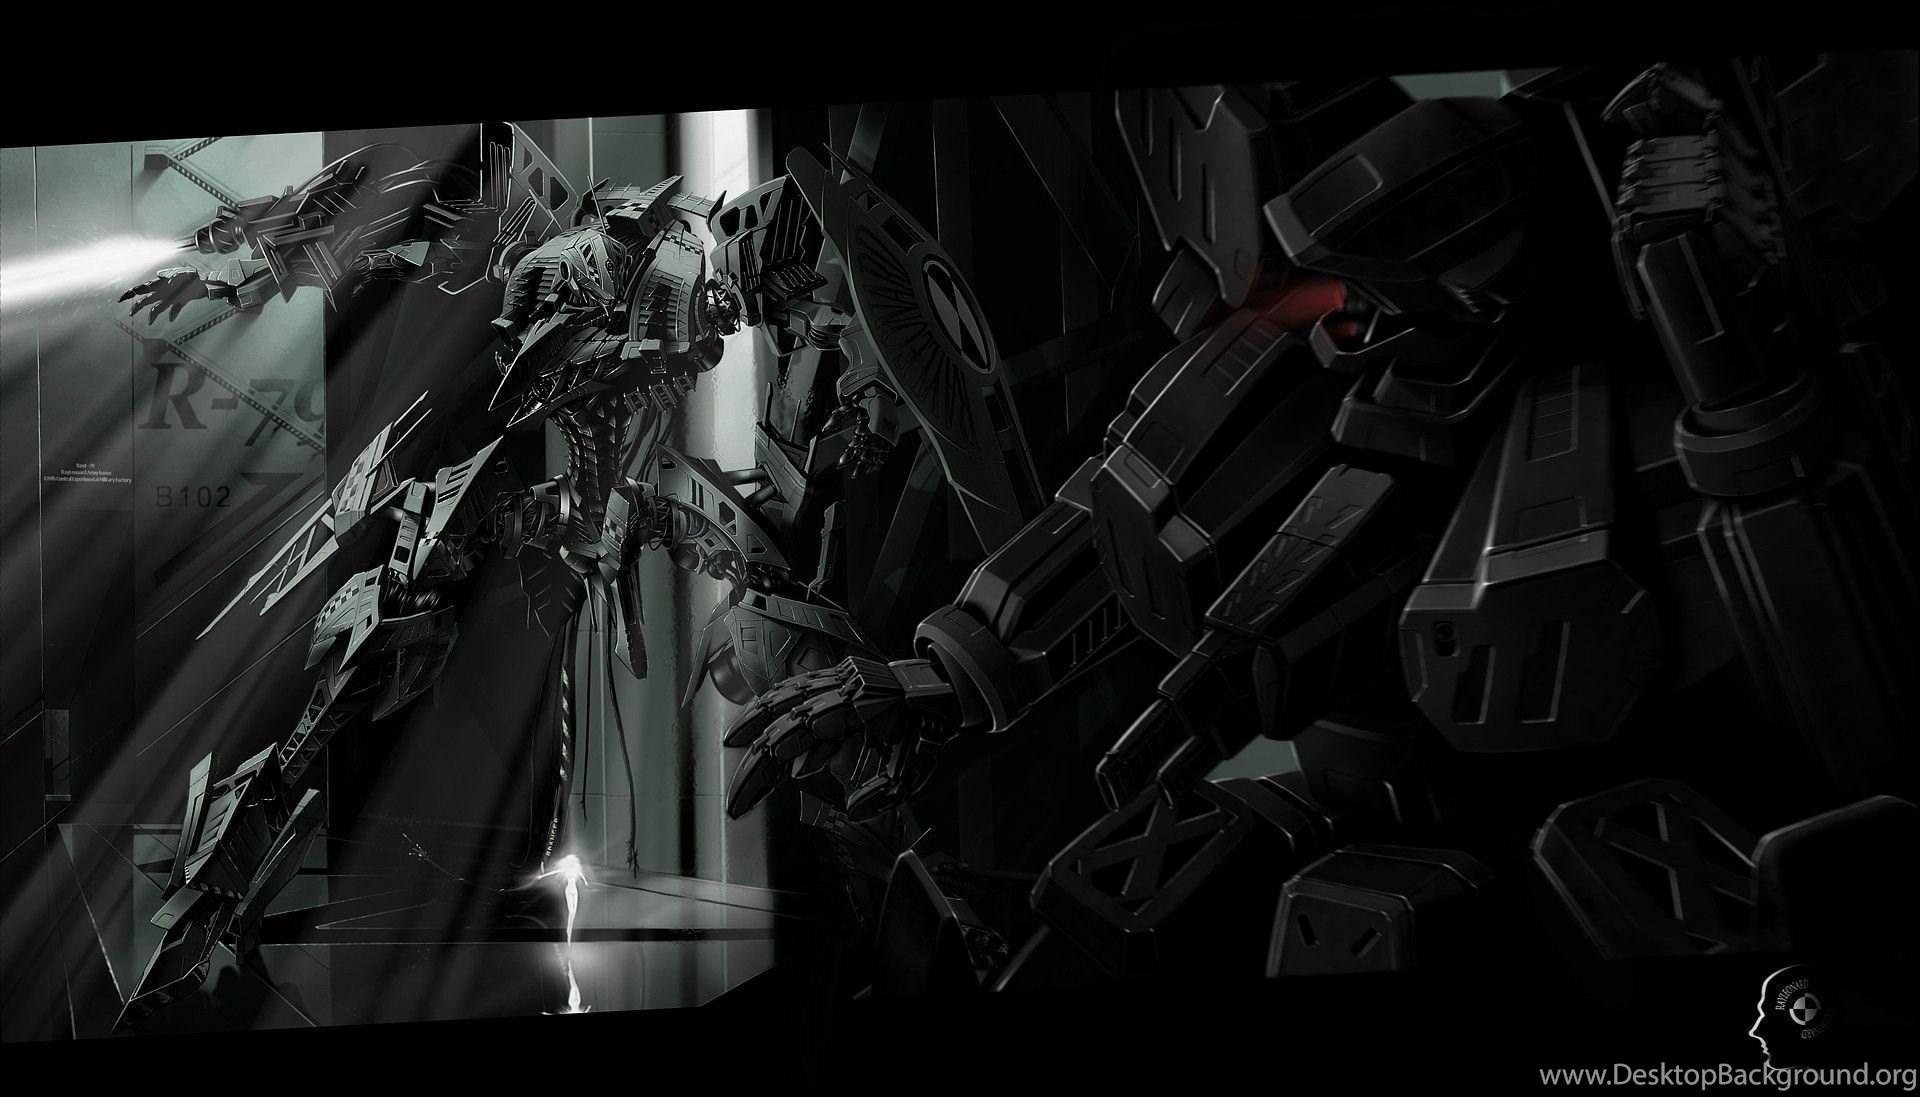 Dark mecha science fiction anime wallpapers desktop - Anime wallpaper black background ...